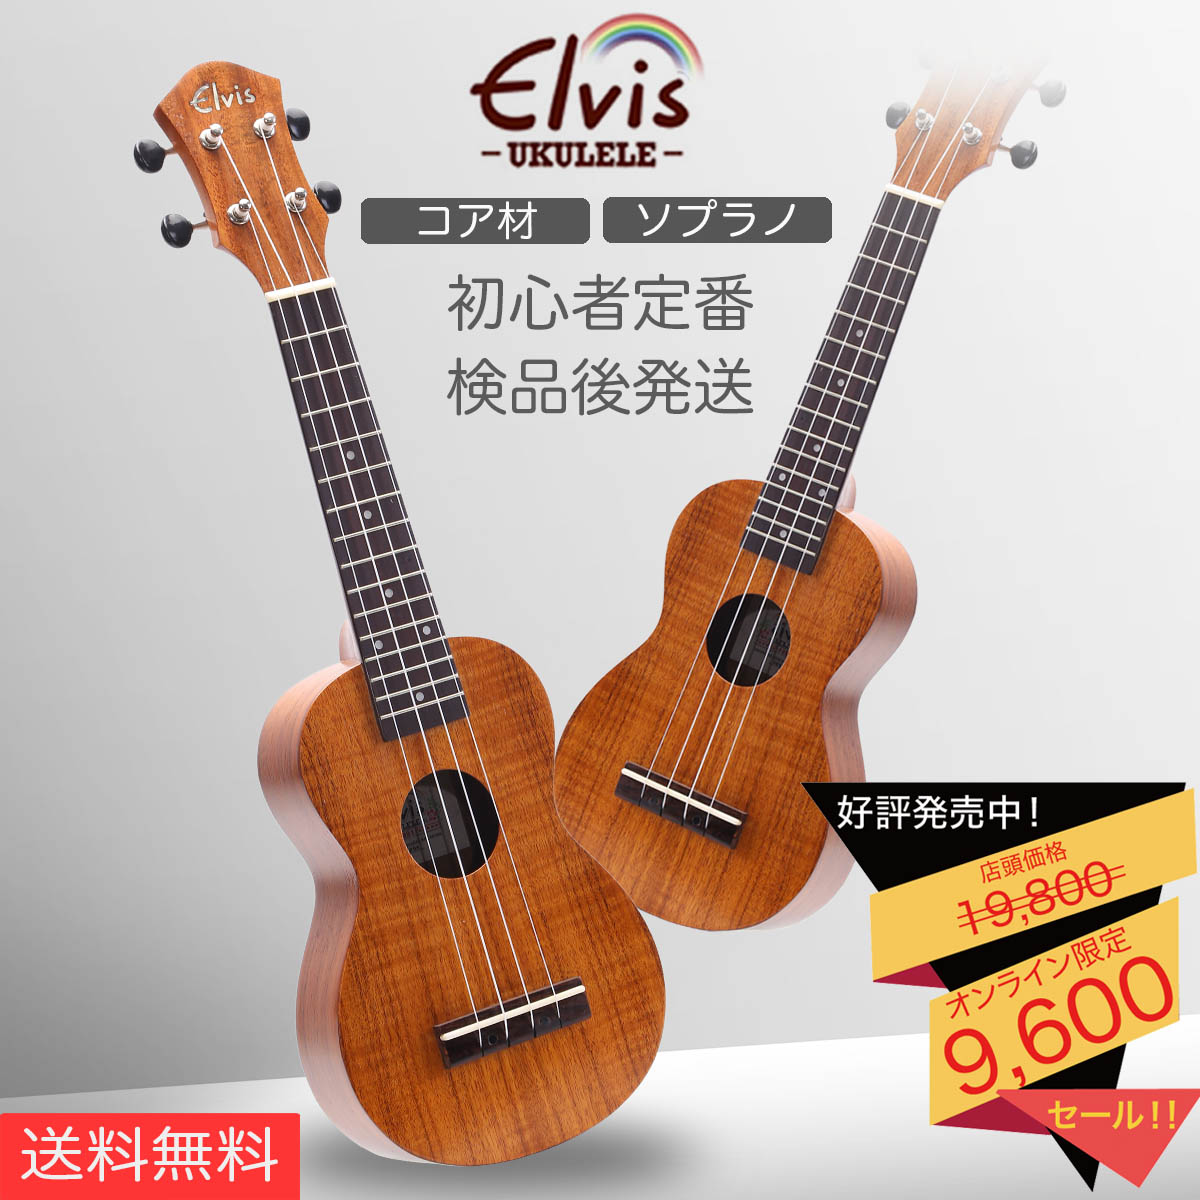 ELVIS K100Sハワイアンコア材 ソプラノウクレレ 美木目 ソフトケース付 (ソプラノ)